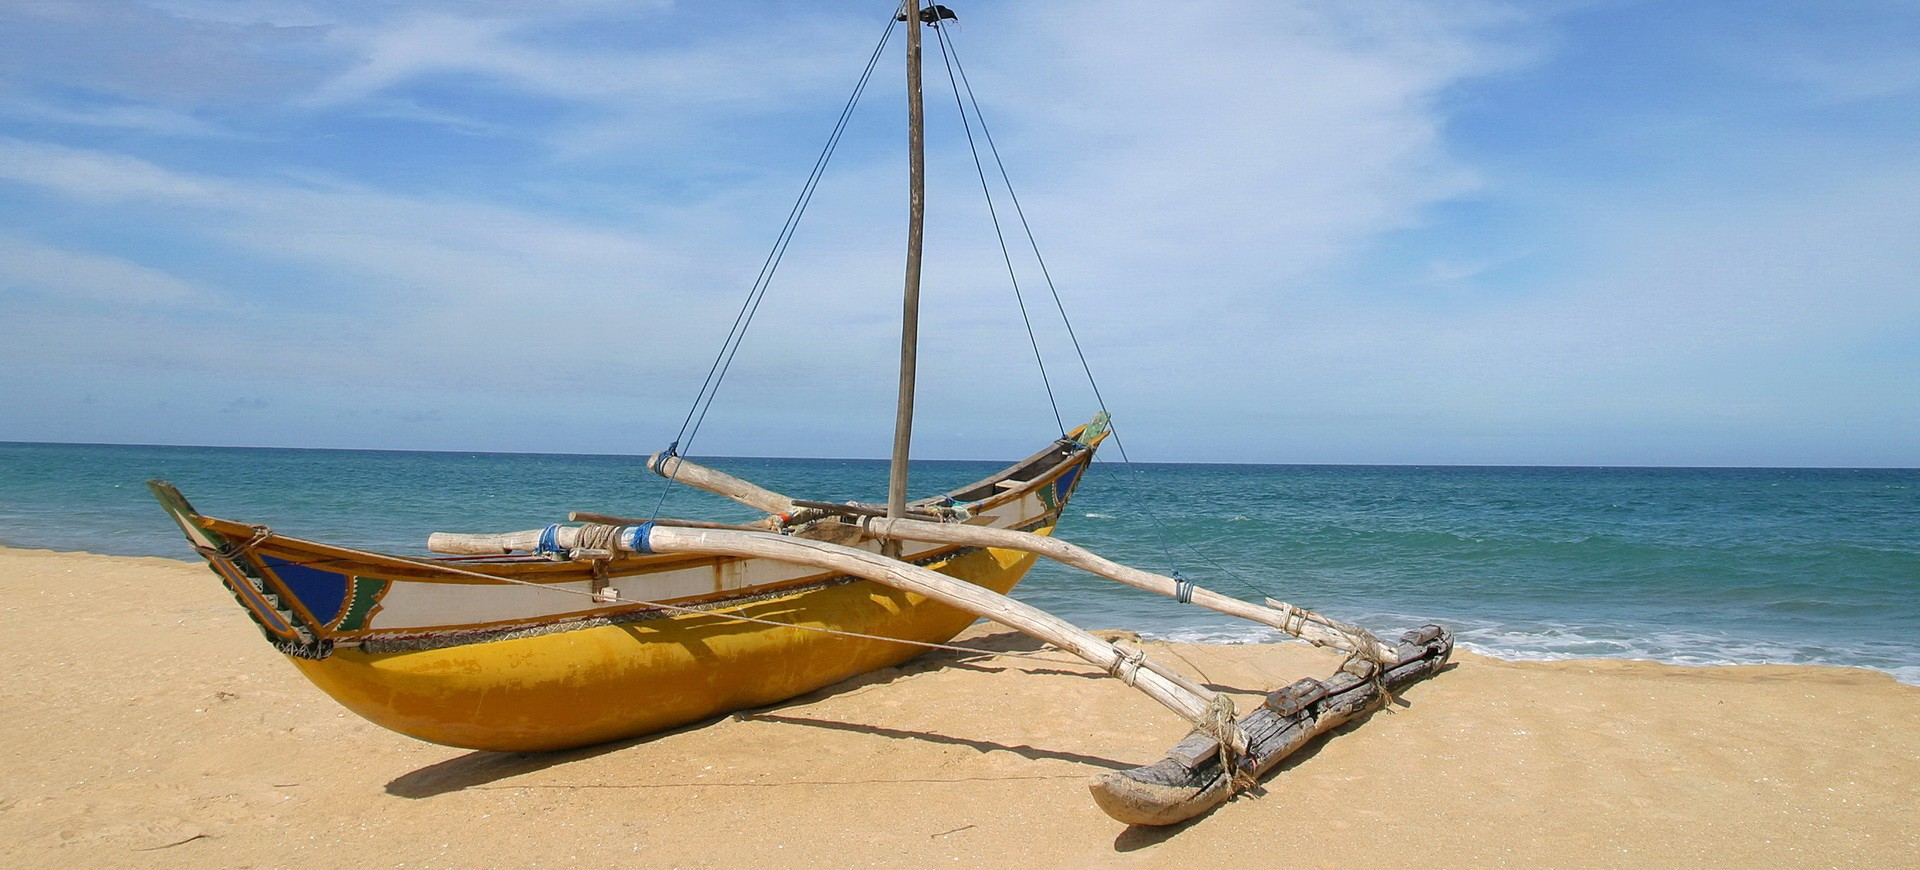 Sri Lanka Négombo Bateau de Pêcheur sur la Plage